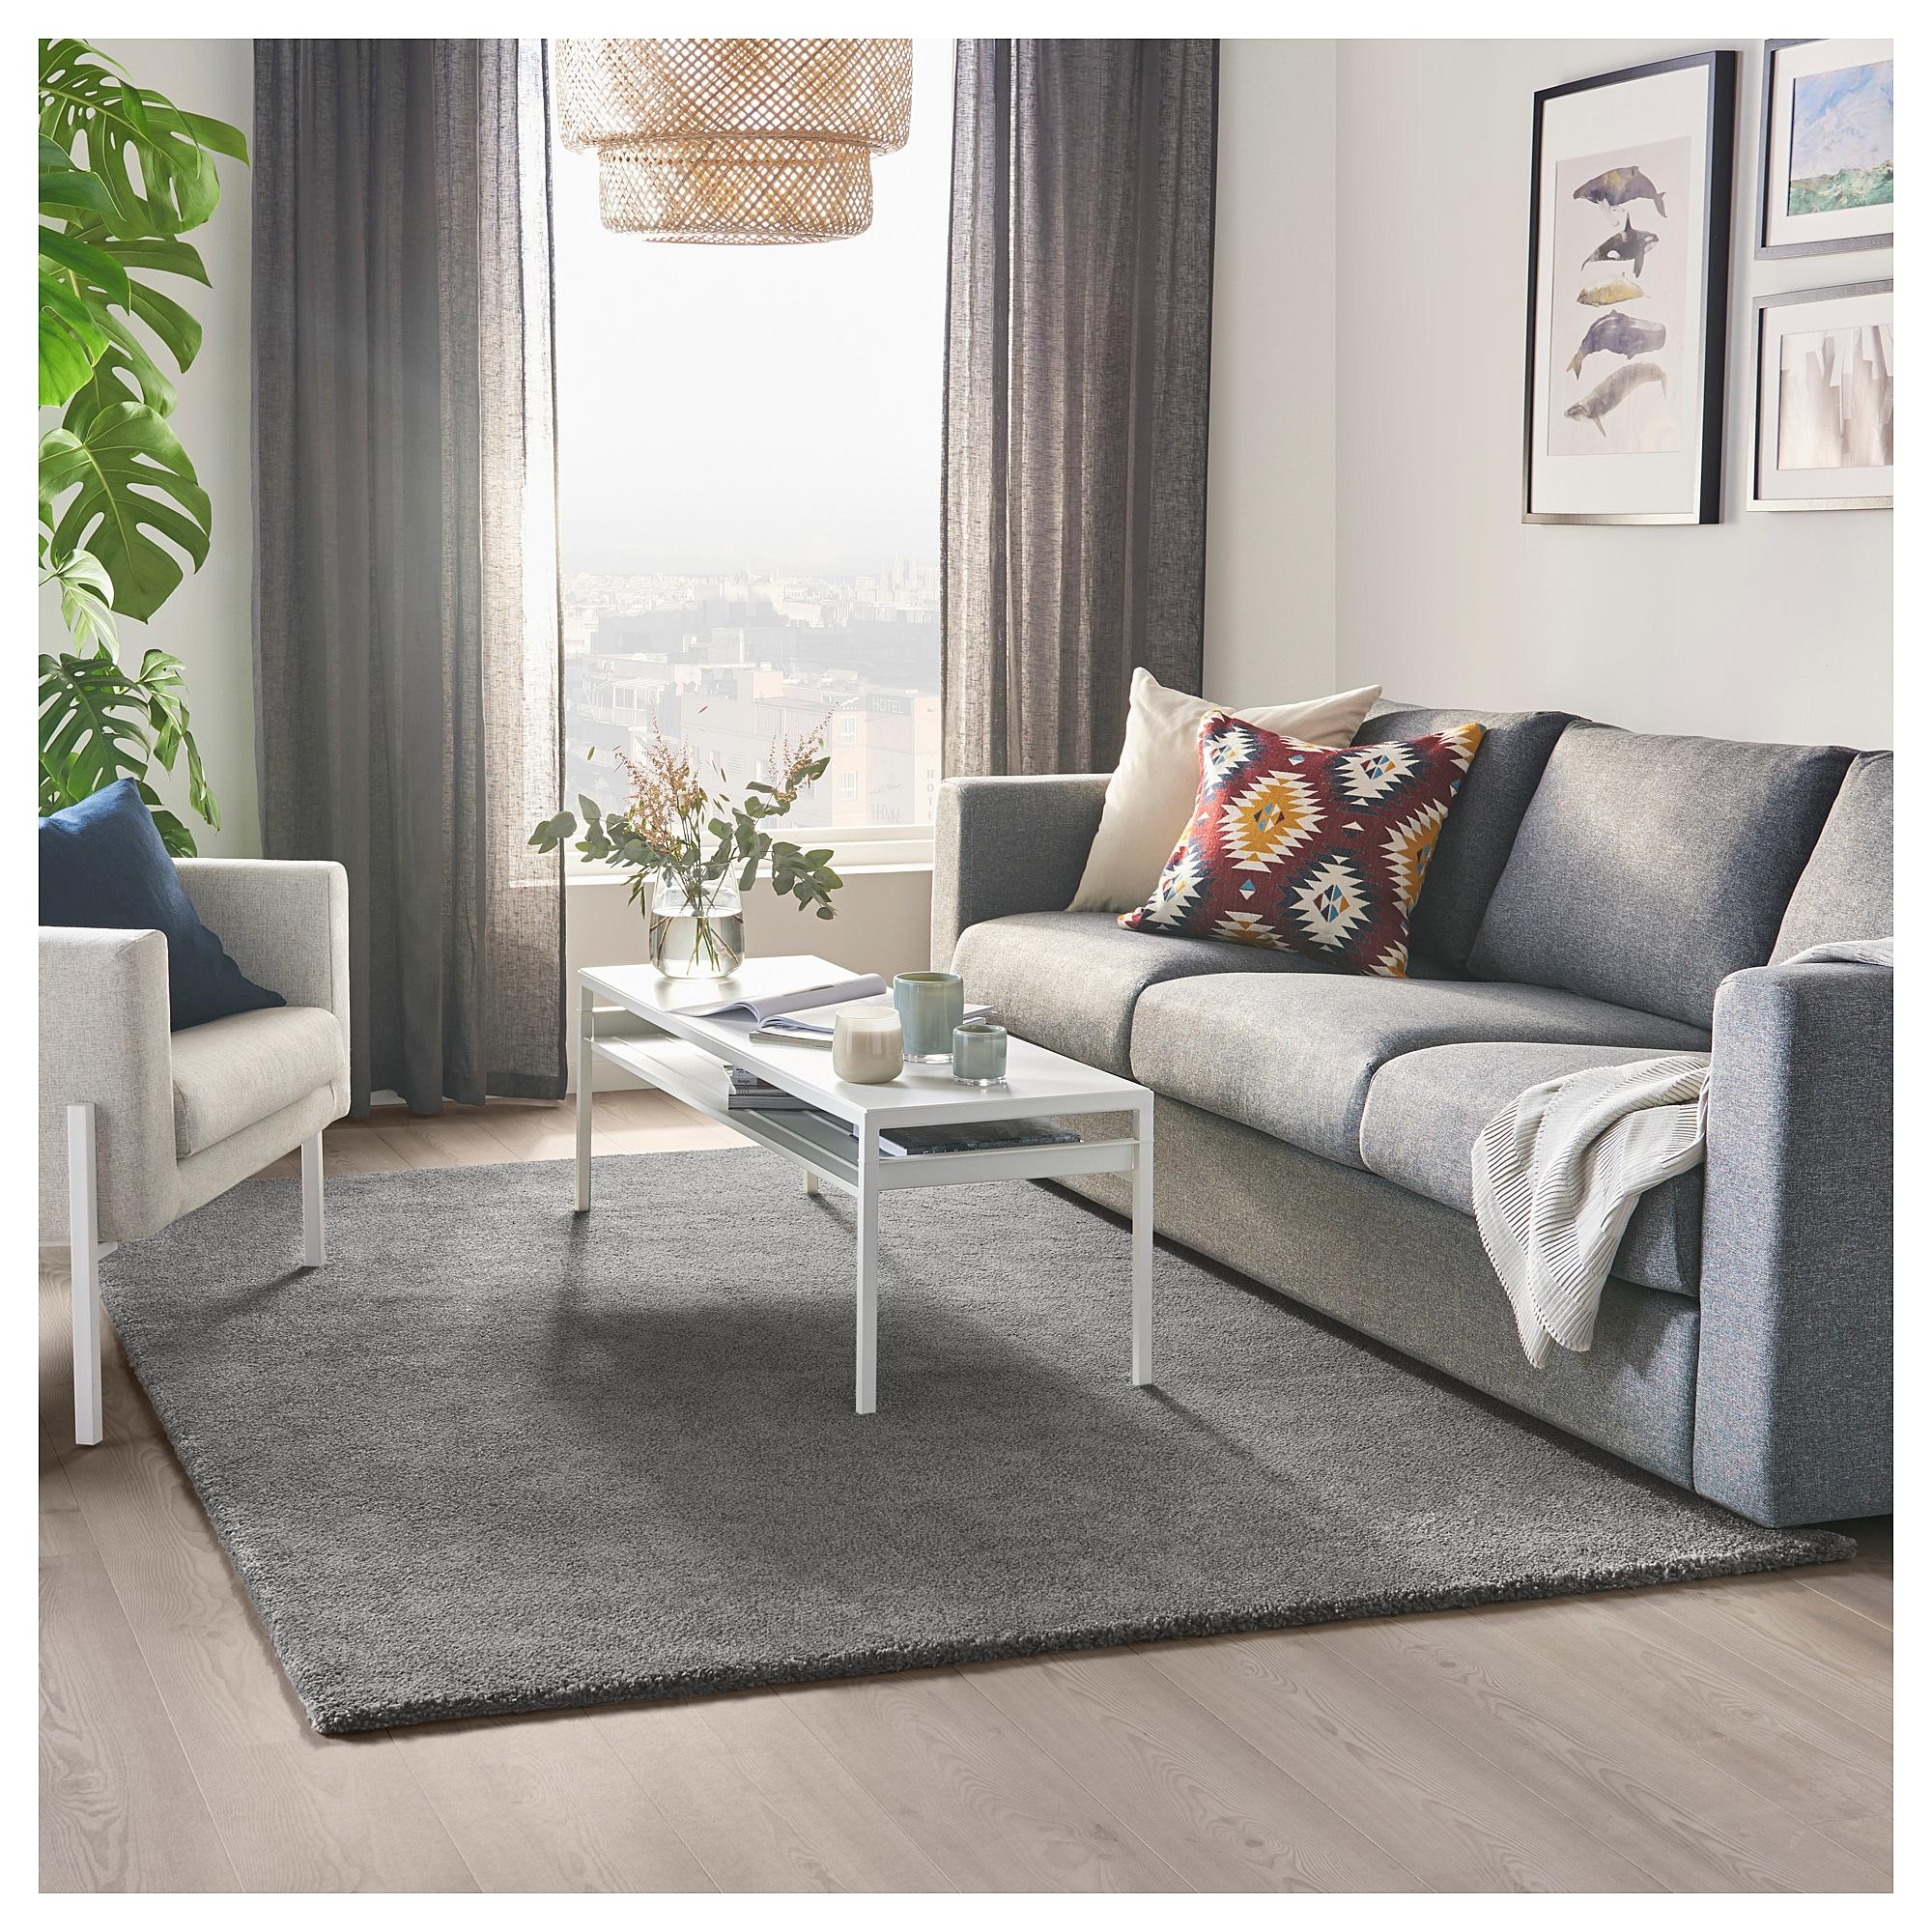 STOENSE medium grey, Rug, low pile, 10x10 cm - IKEA  Rugs in